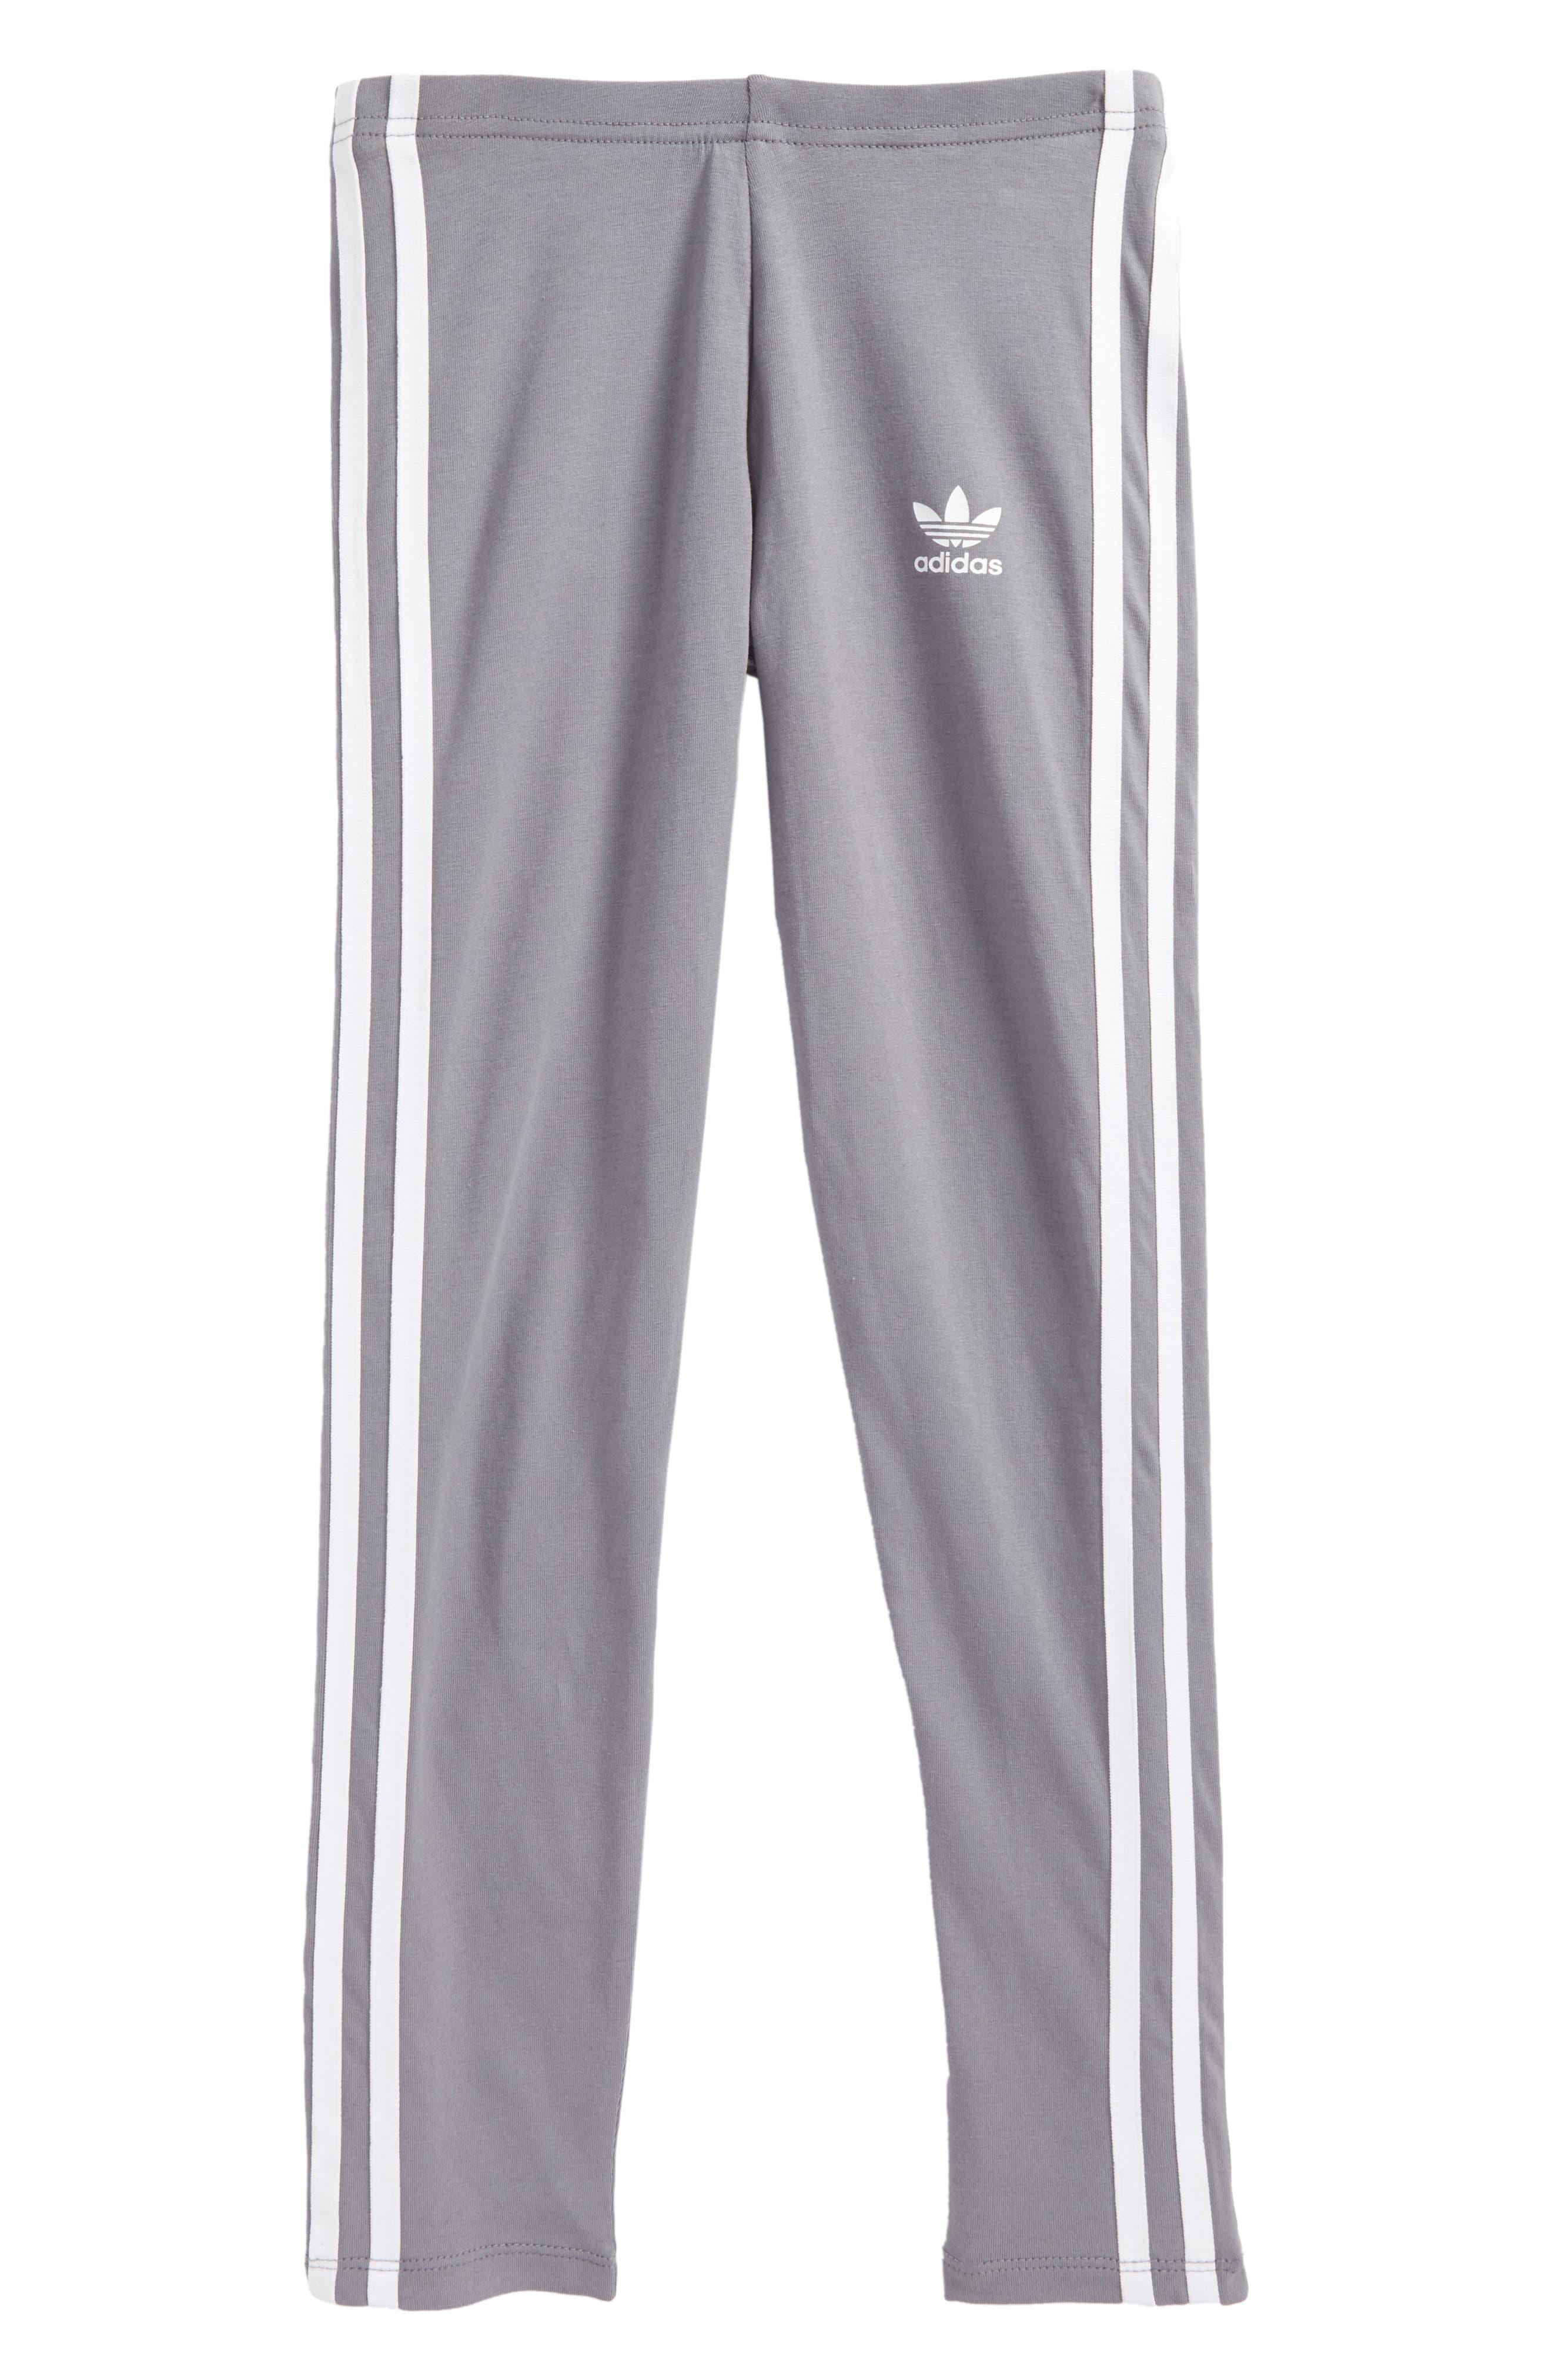 Main Image - adidas 3-Stripes Leggings (Big Girls)